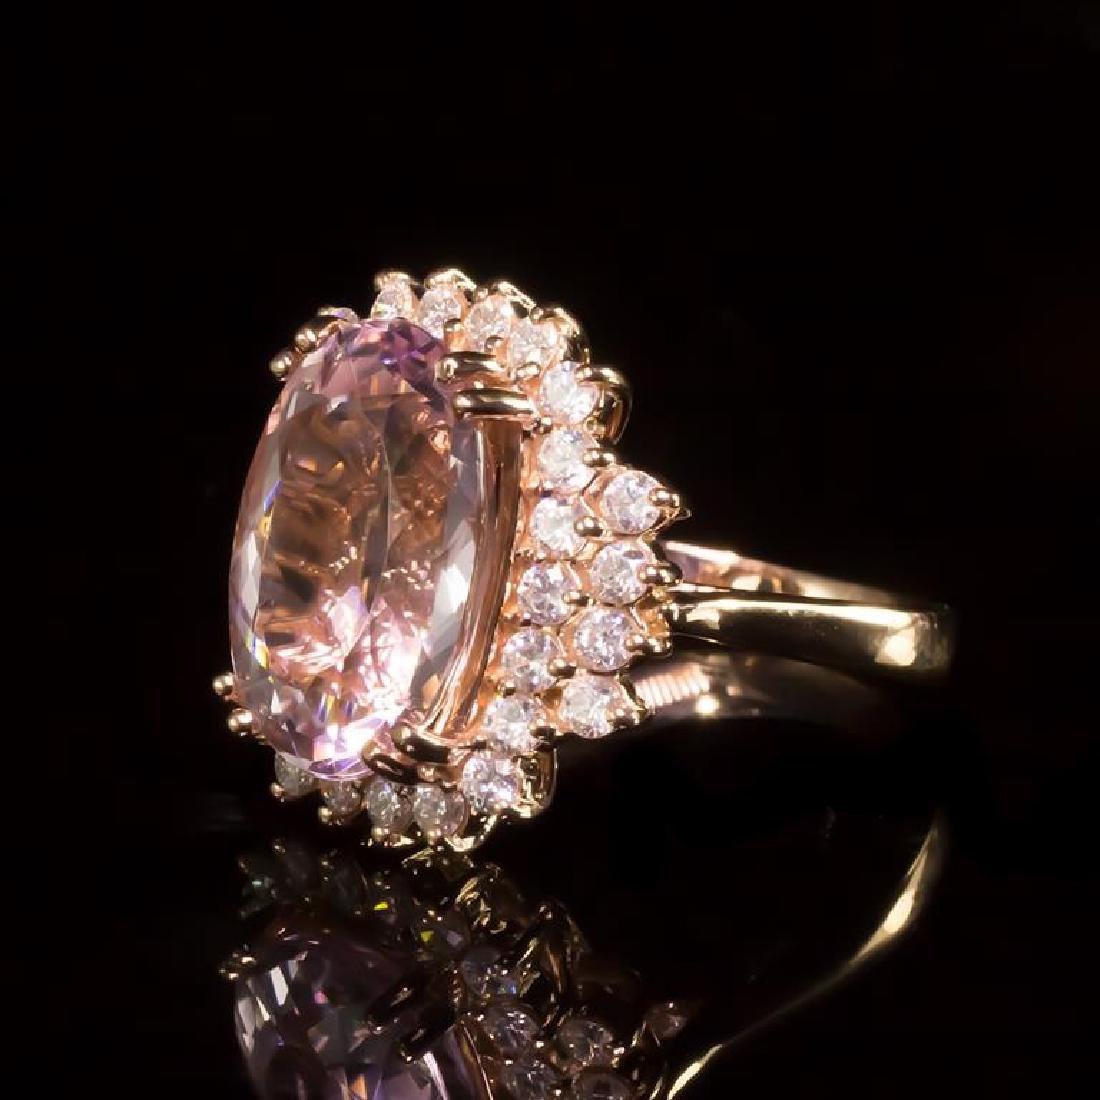 14K Gold 6.99ct Morganite 1.10ct Diamond Ring - 2